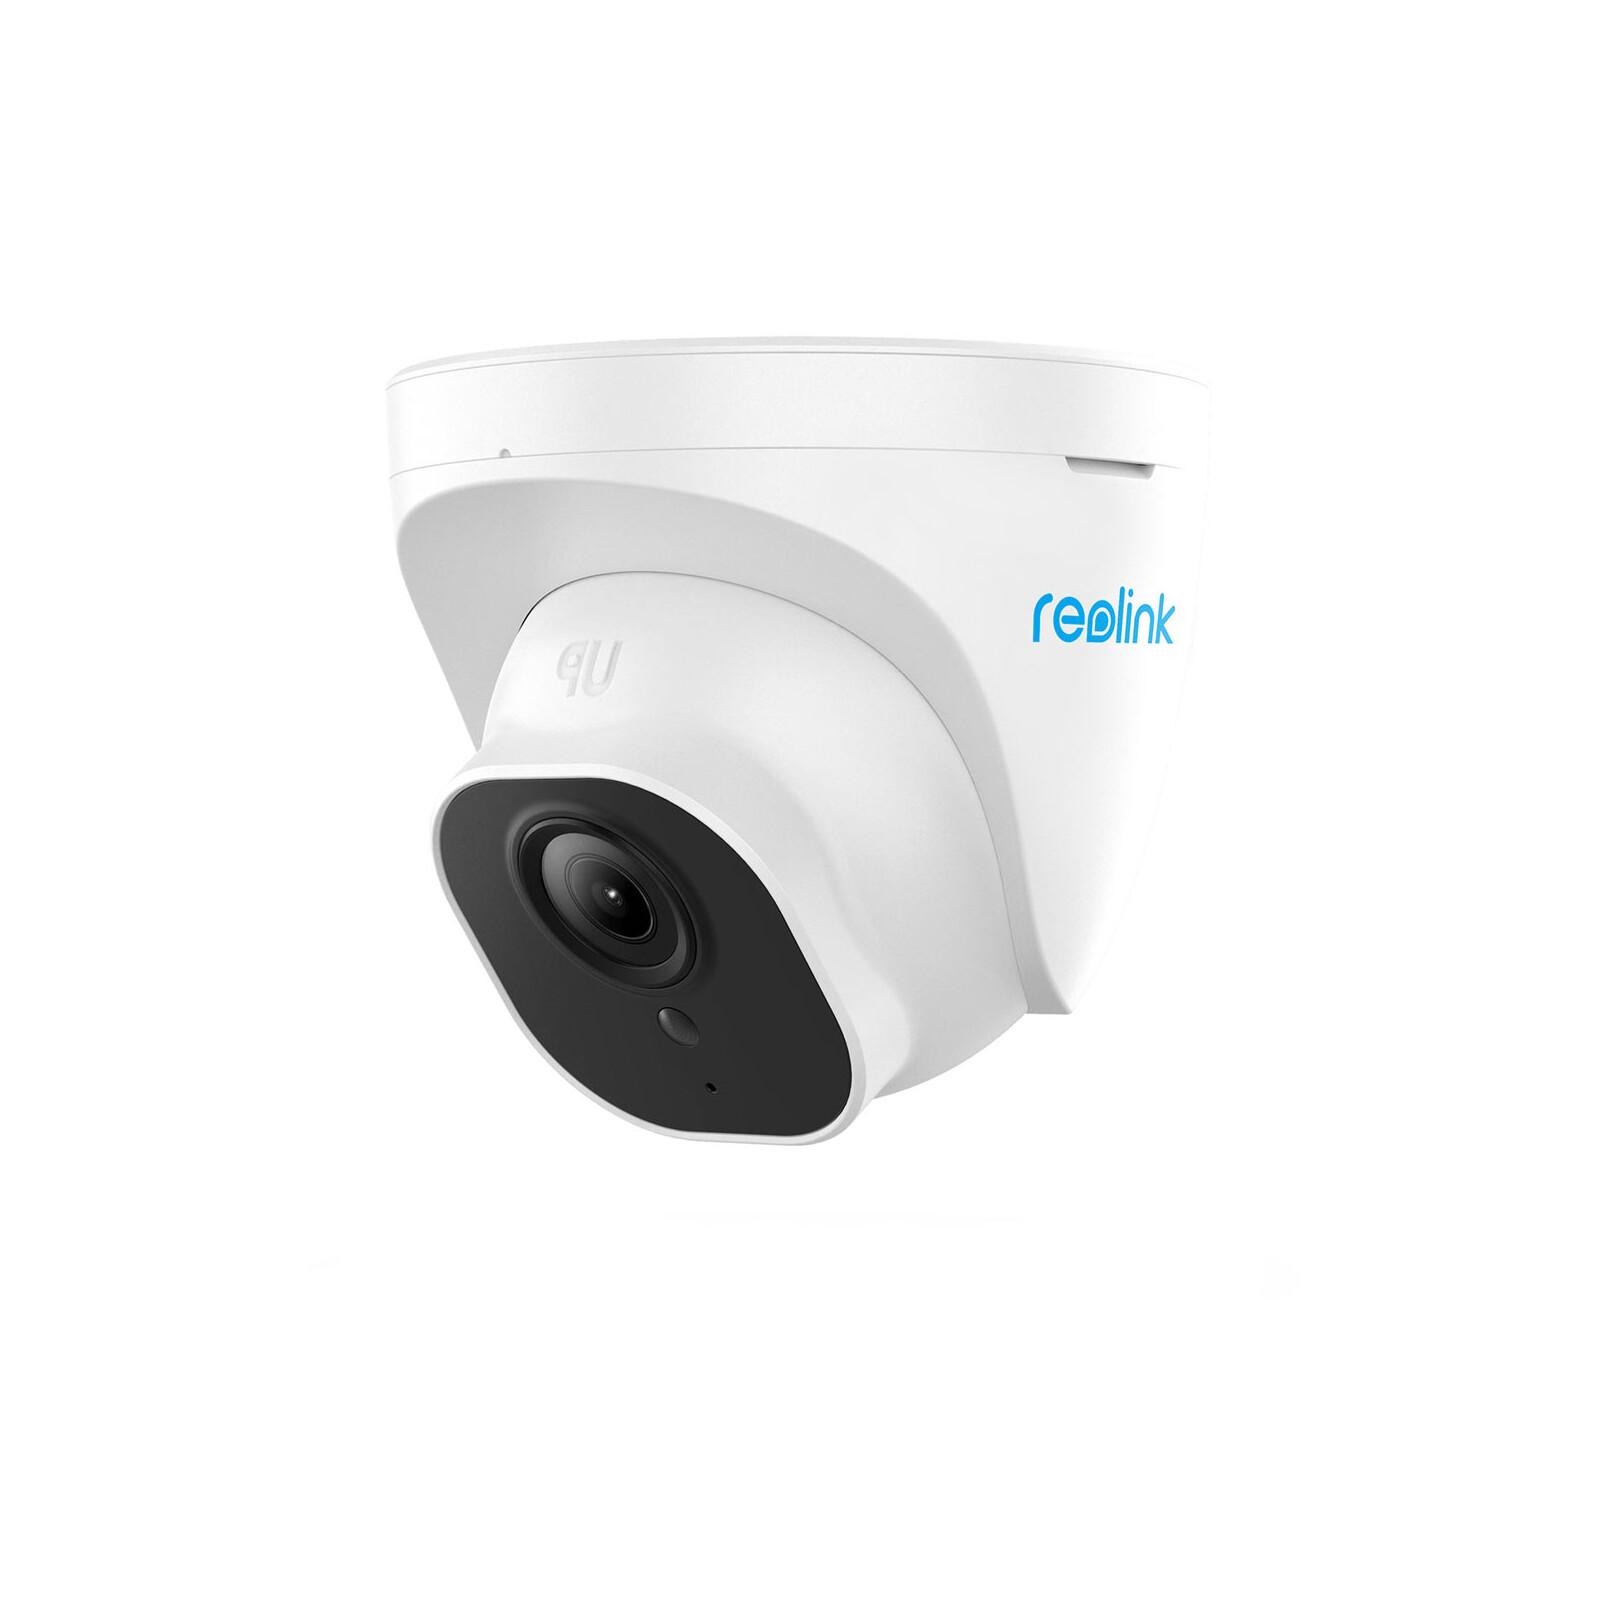 Reolink Überwachungskamera RLK16-820D8-A